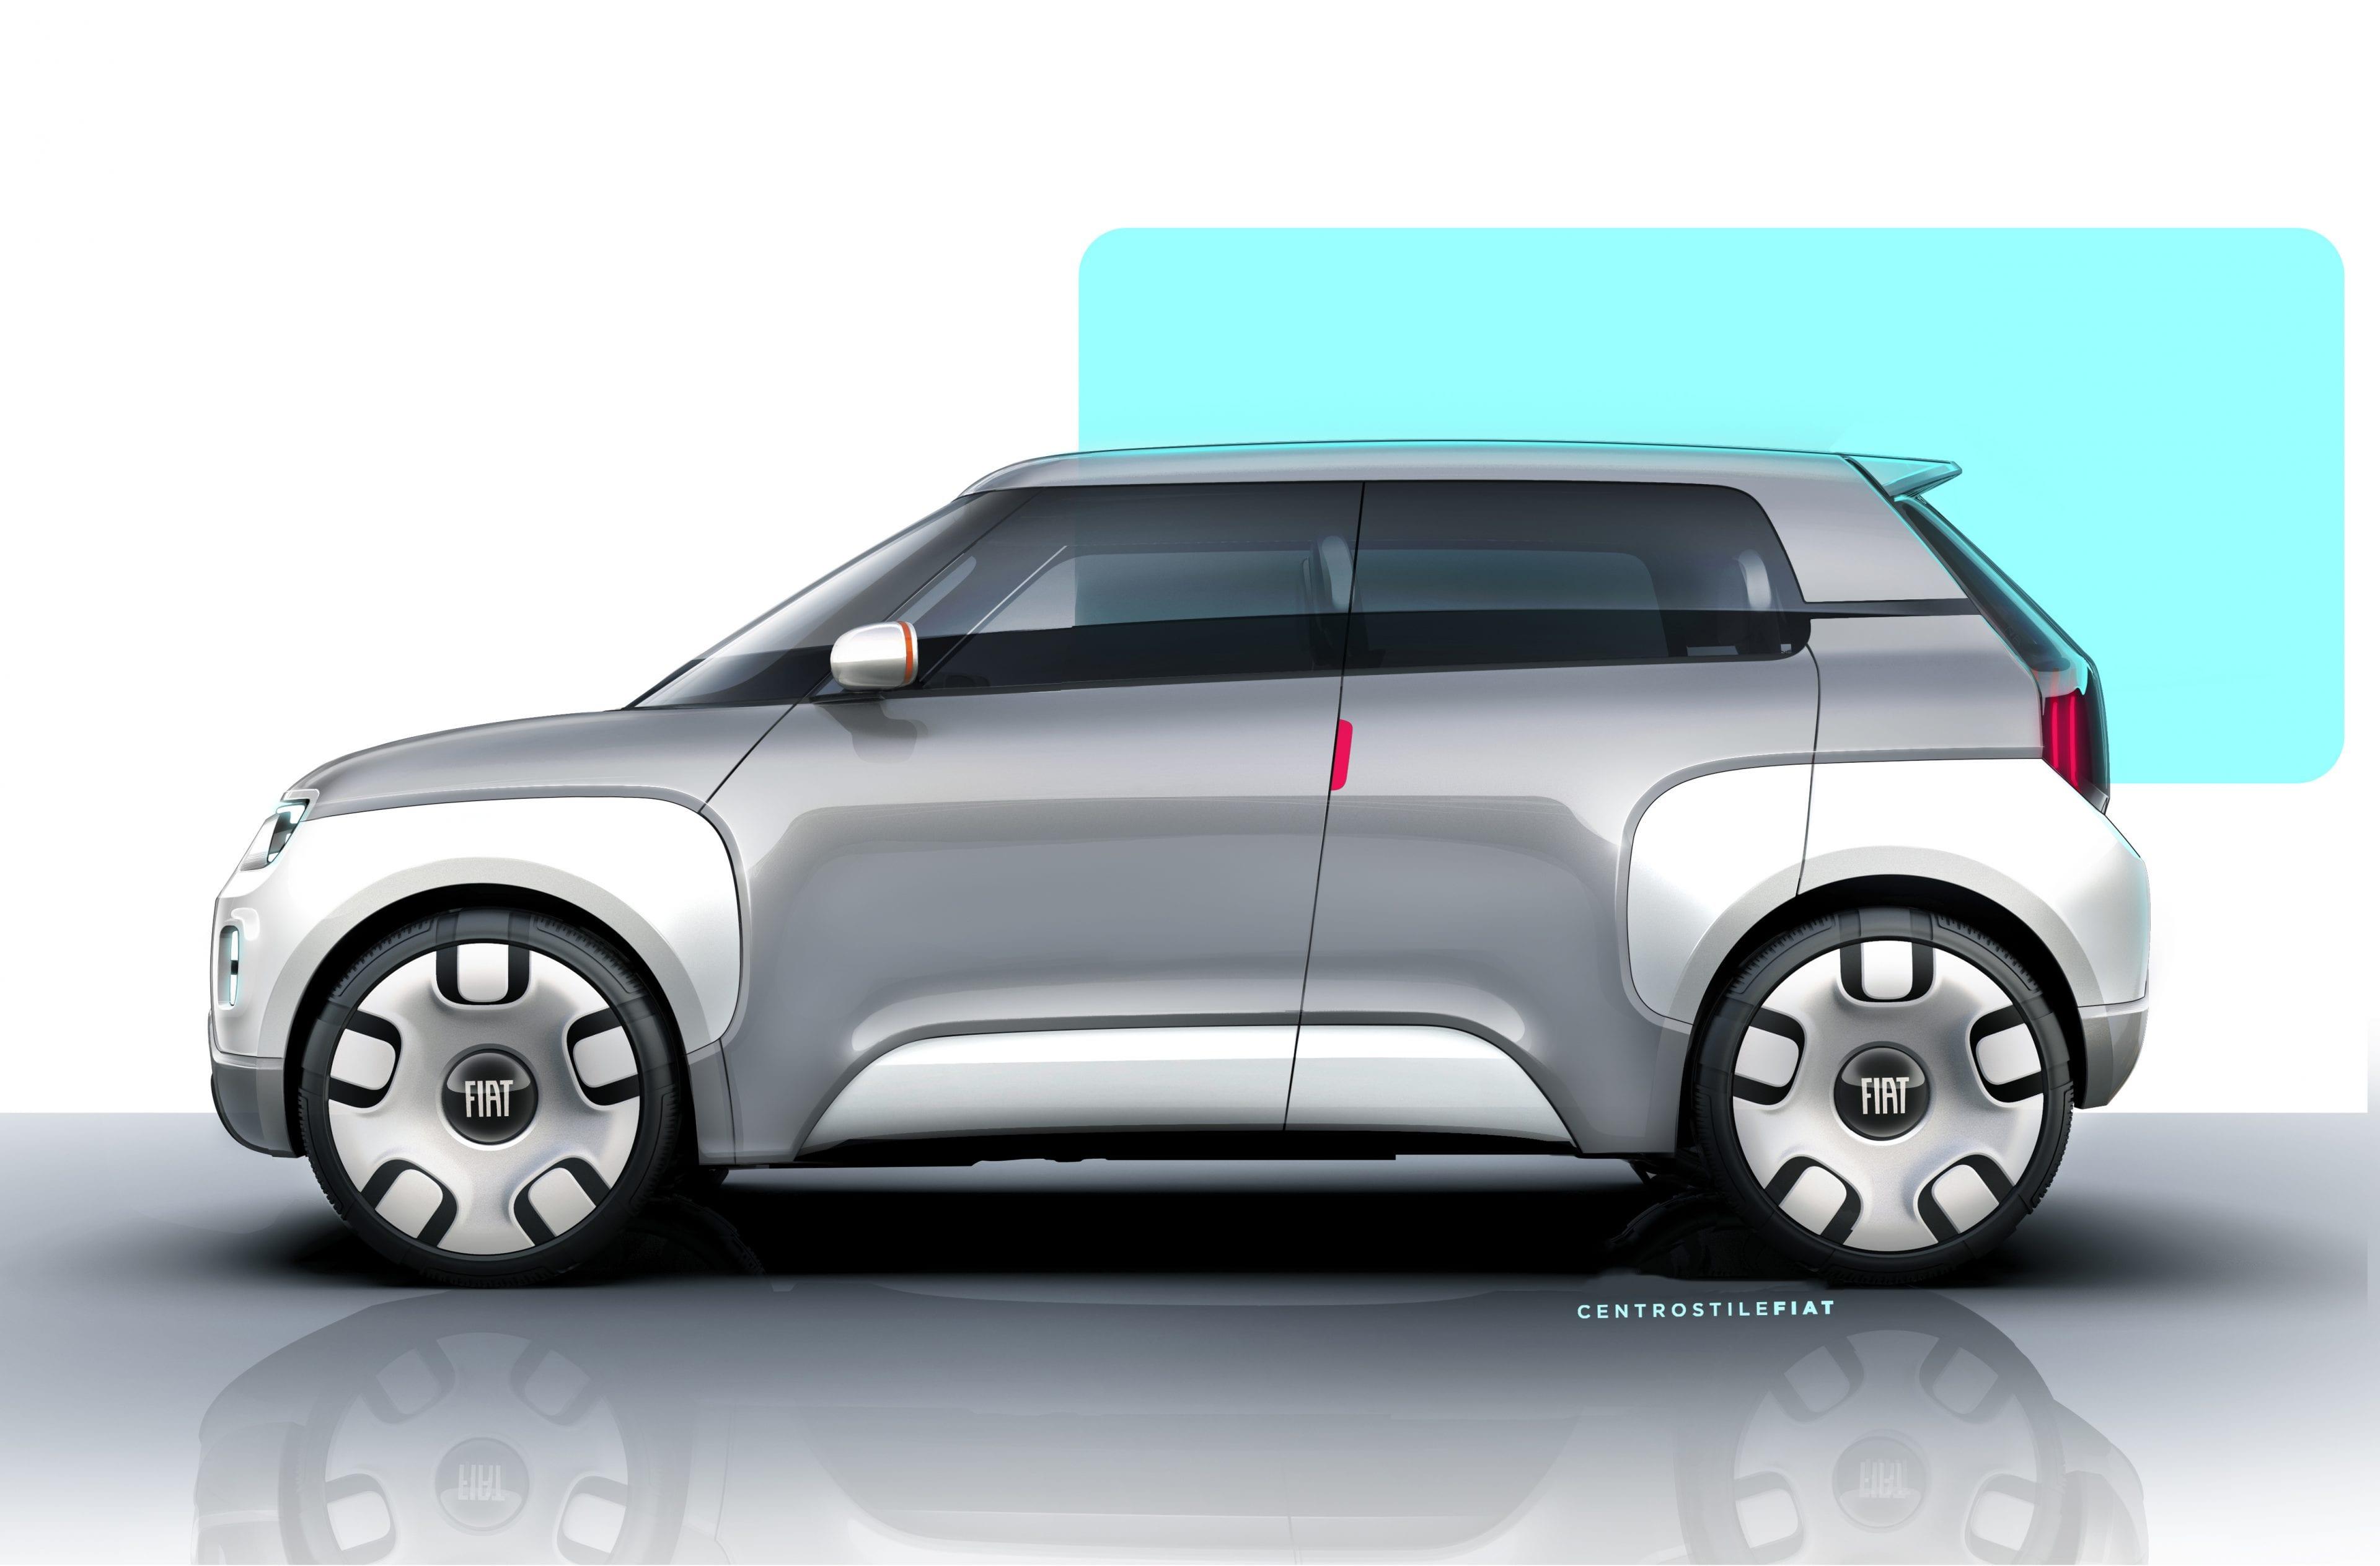 Fiat Concept Centoventi - zijkant